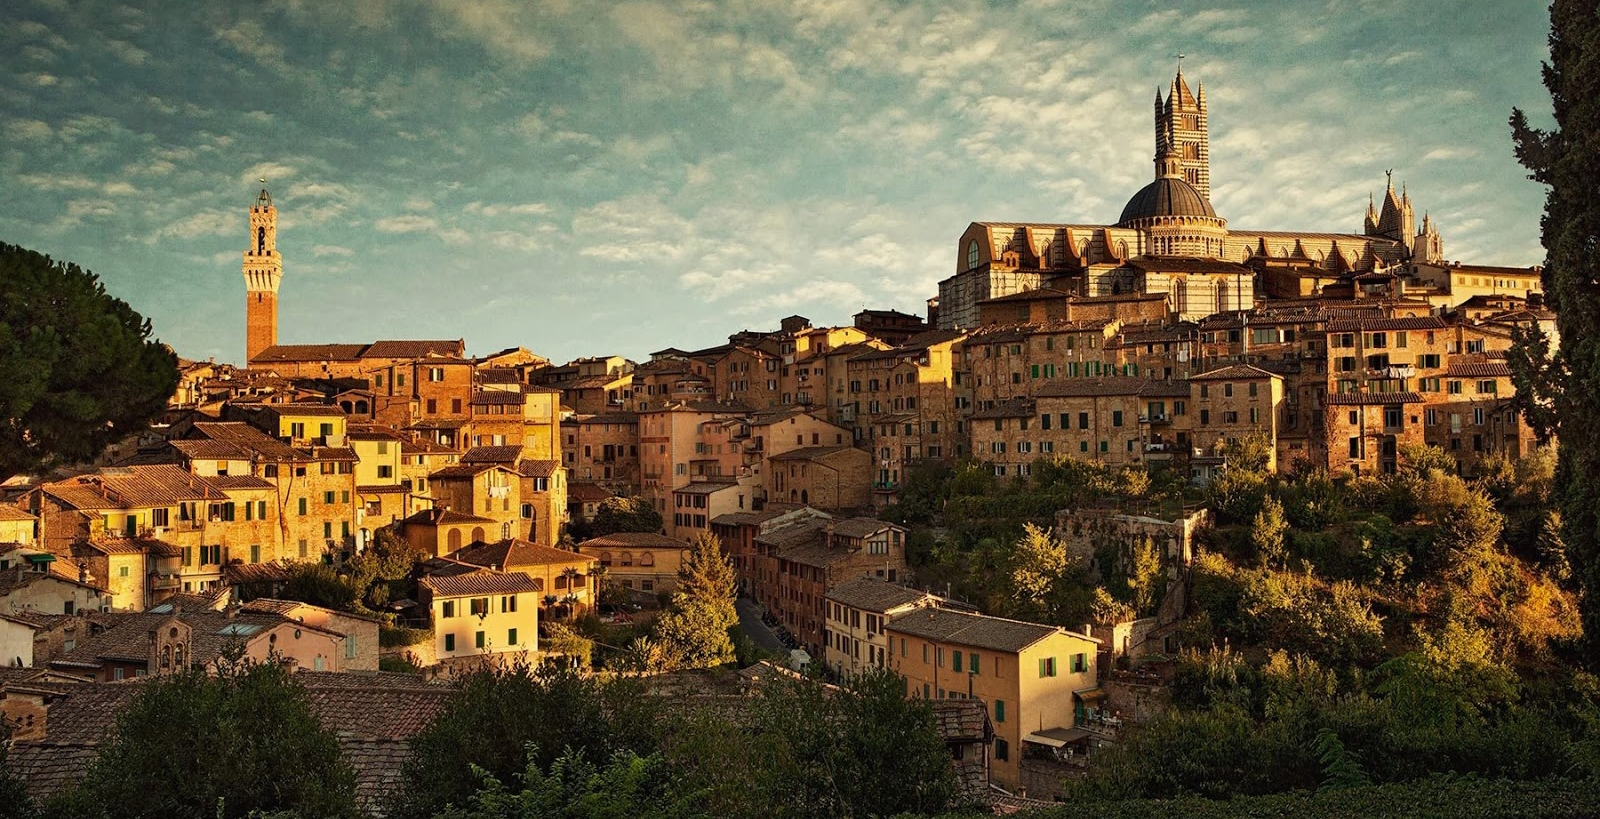 Via Francigena—Crossing Tuscany